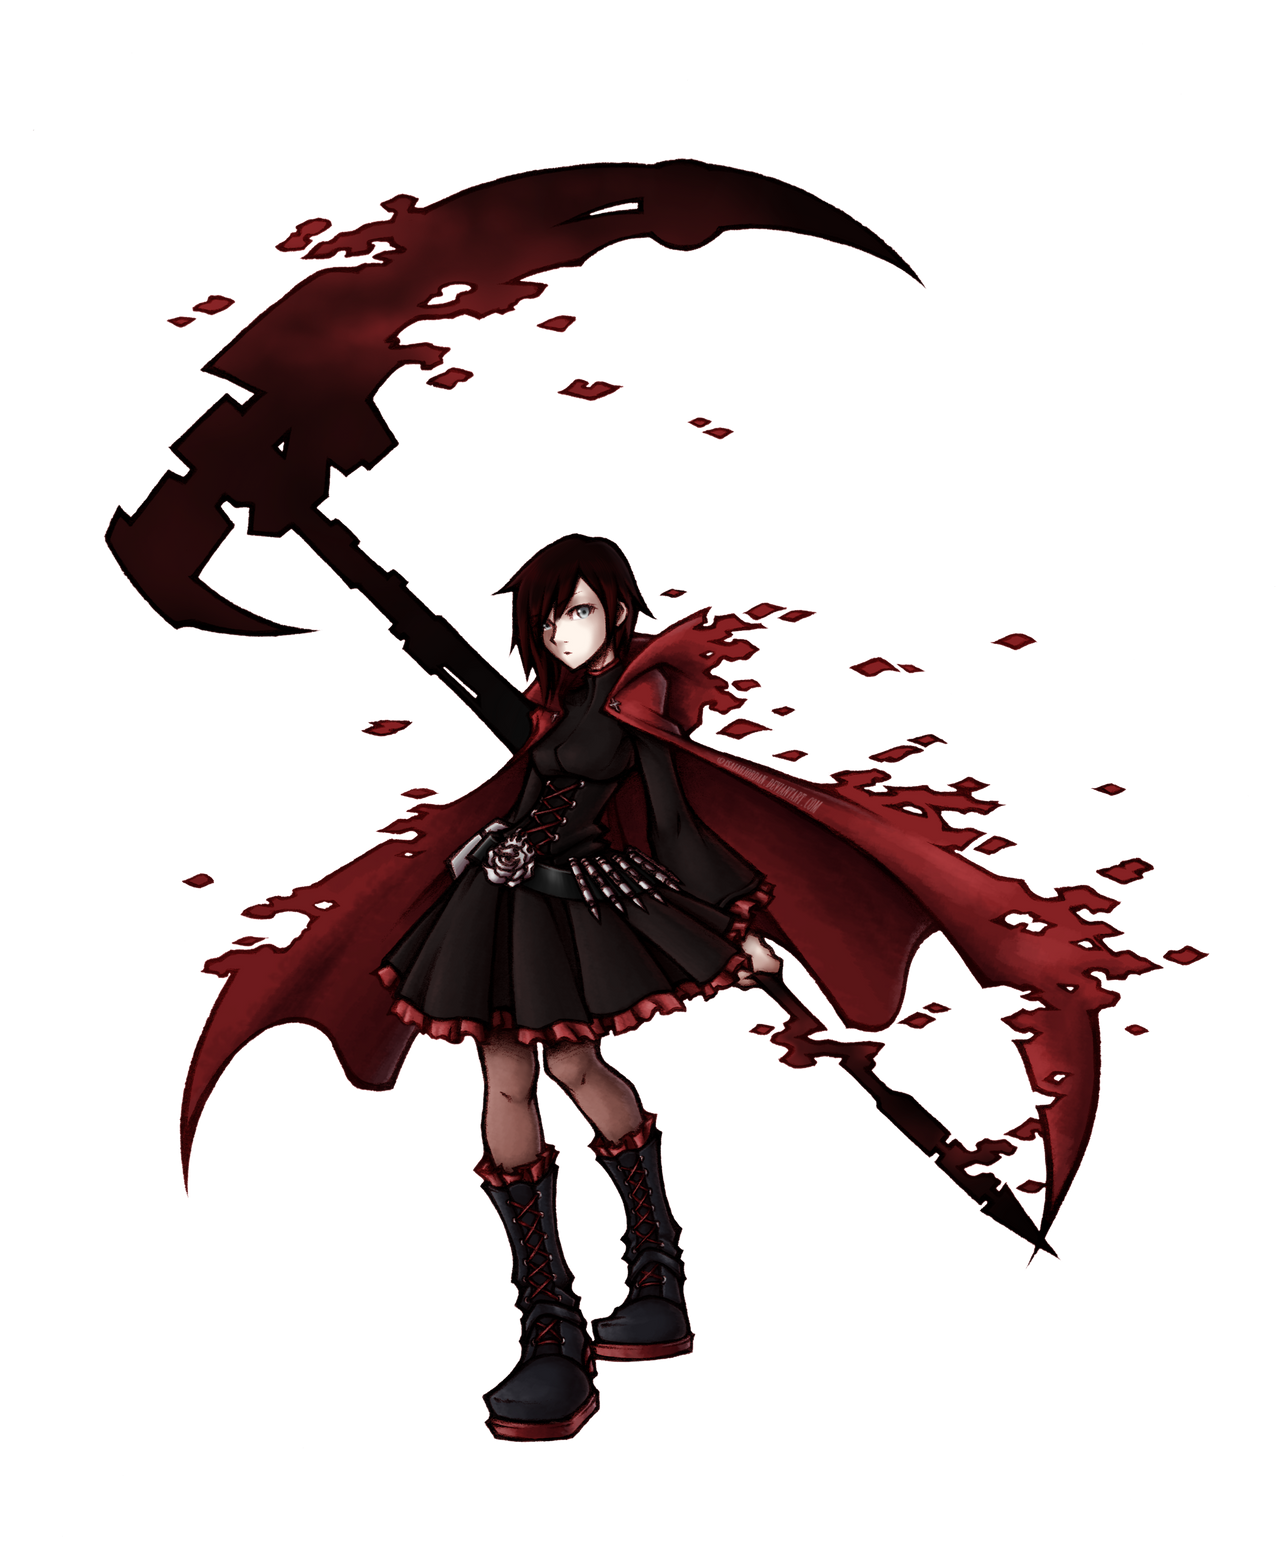 RWBY: Ruby Rose by isaiahjordan